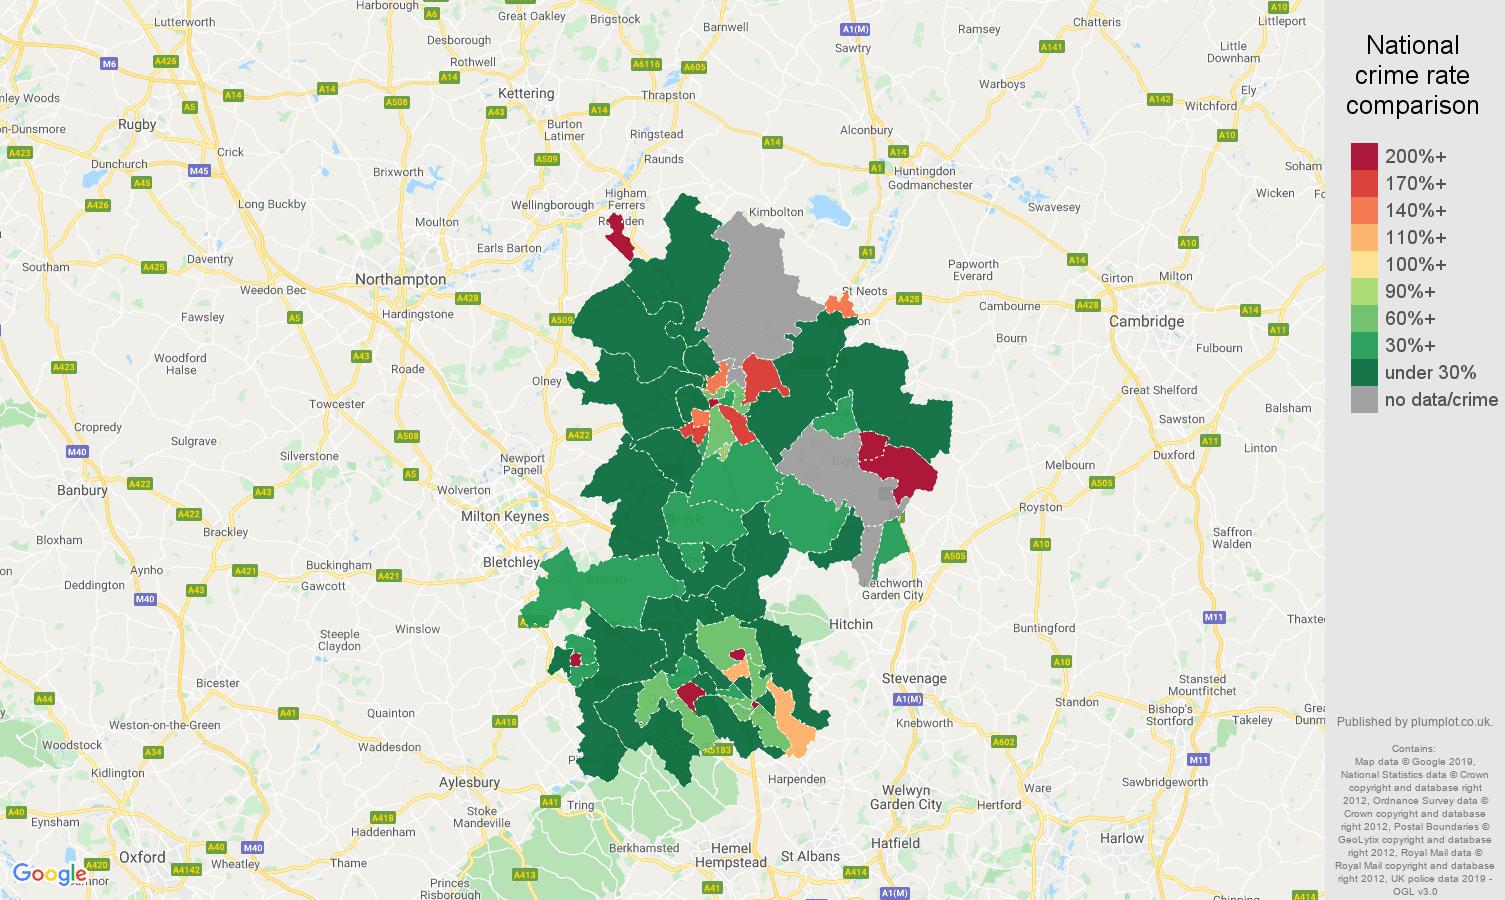 Bedfordshire shoplifting crime rate comparison map